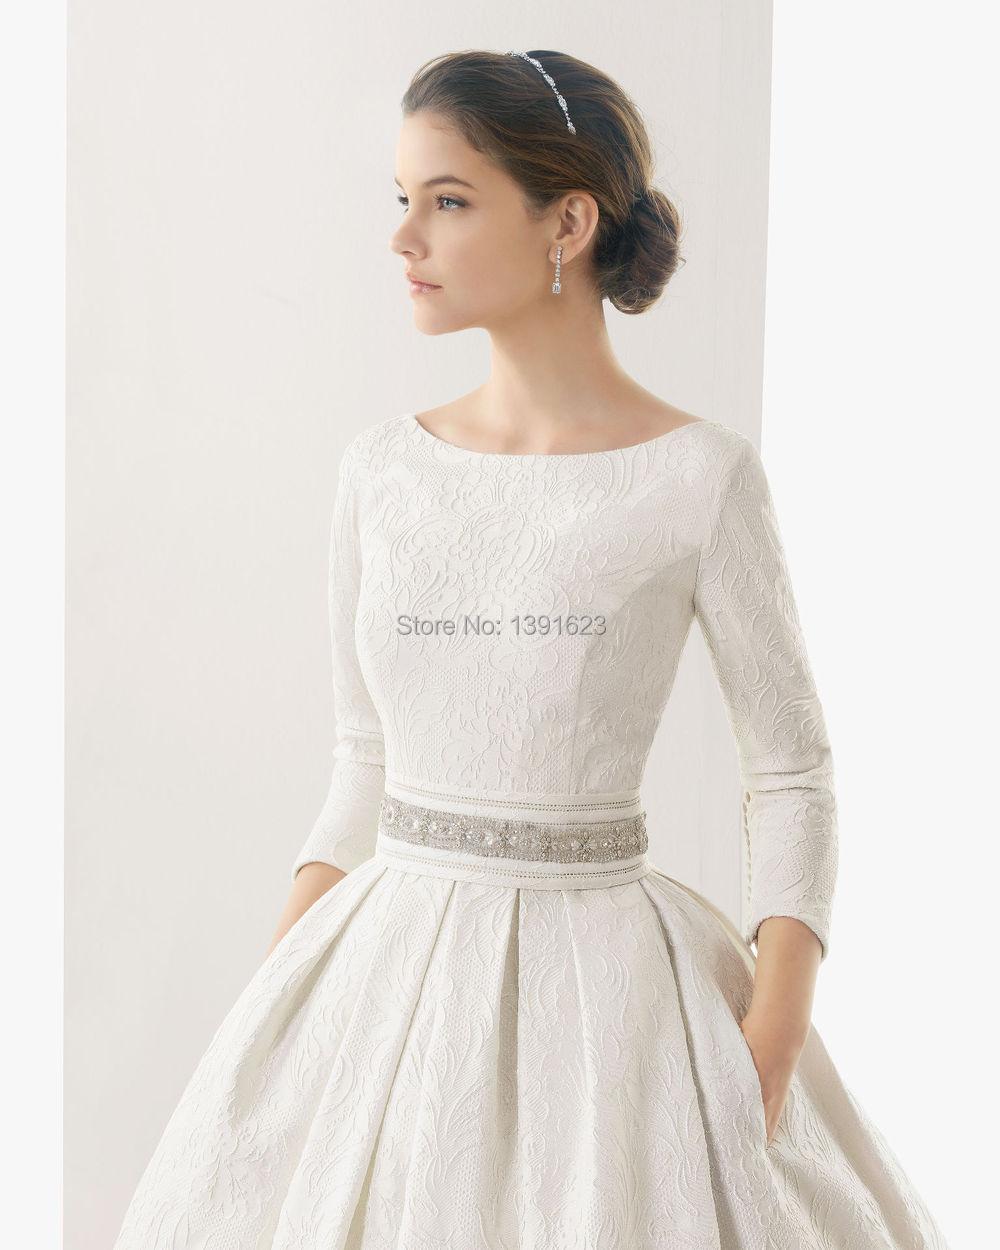 Quarter Sleeve Wedding Dresses